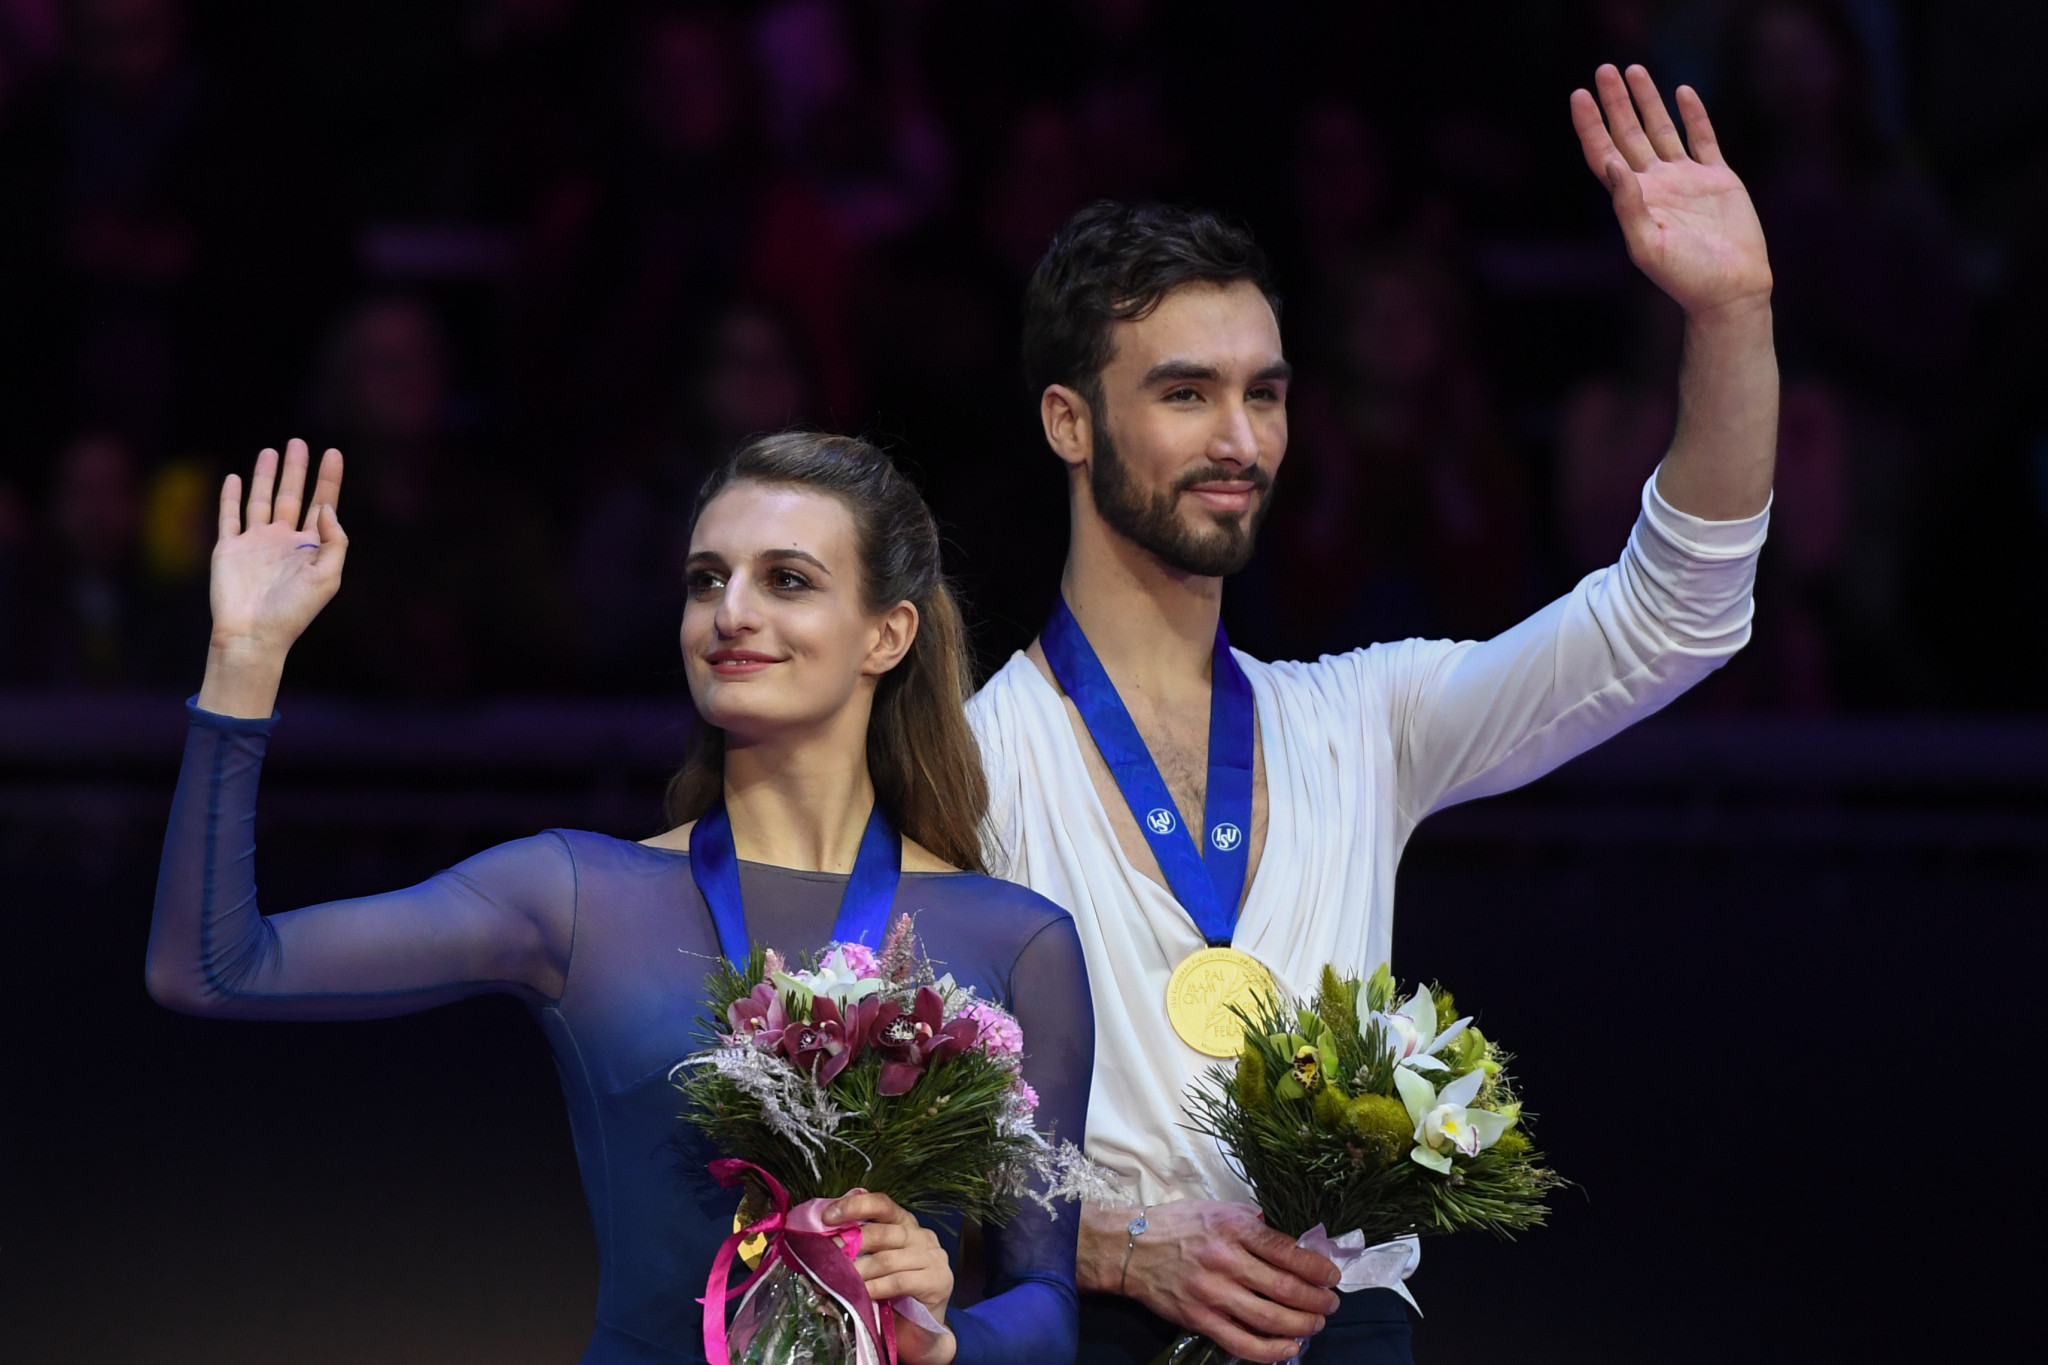 Gabriella Papadakis and Guillaume Cizeron have now won four consecutive European titles ©Getty Images